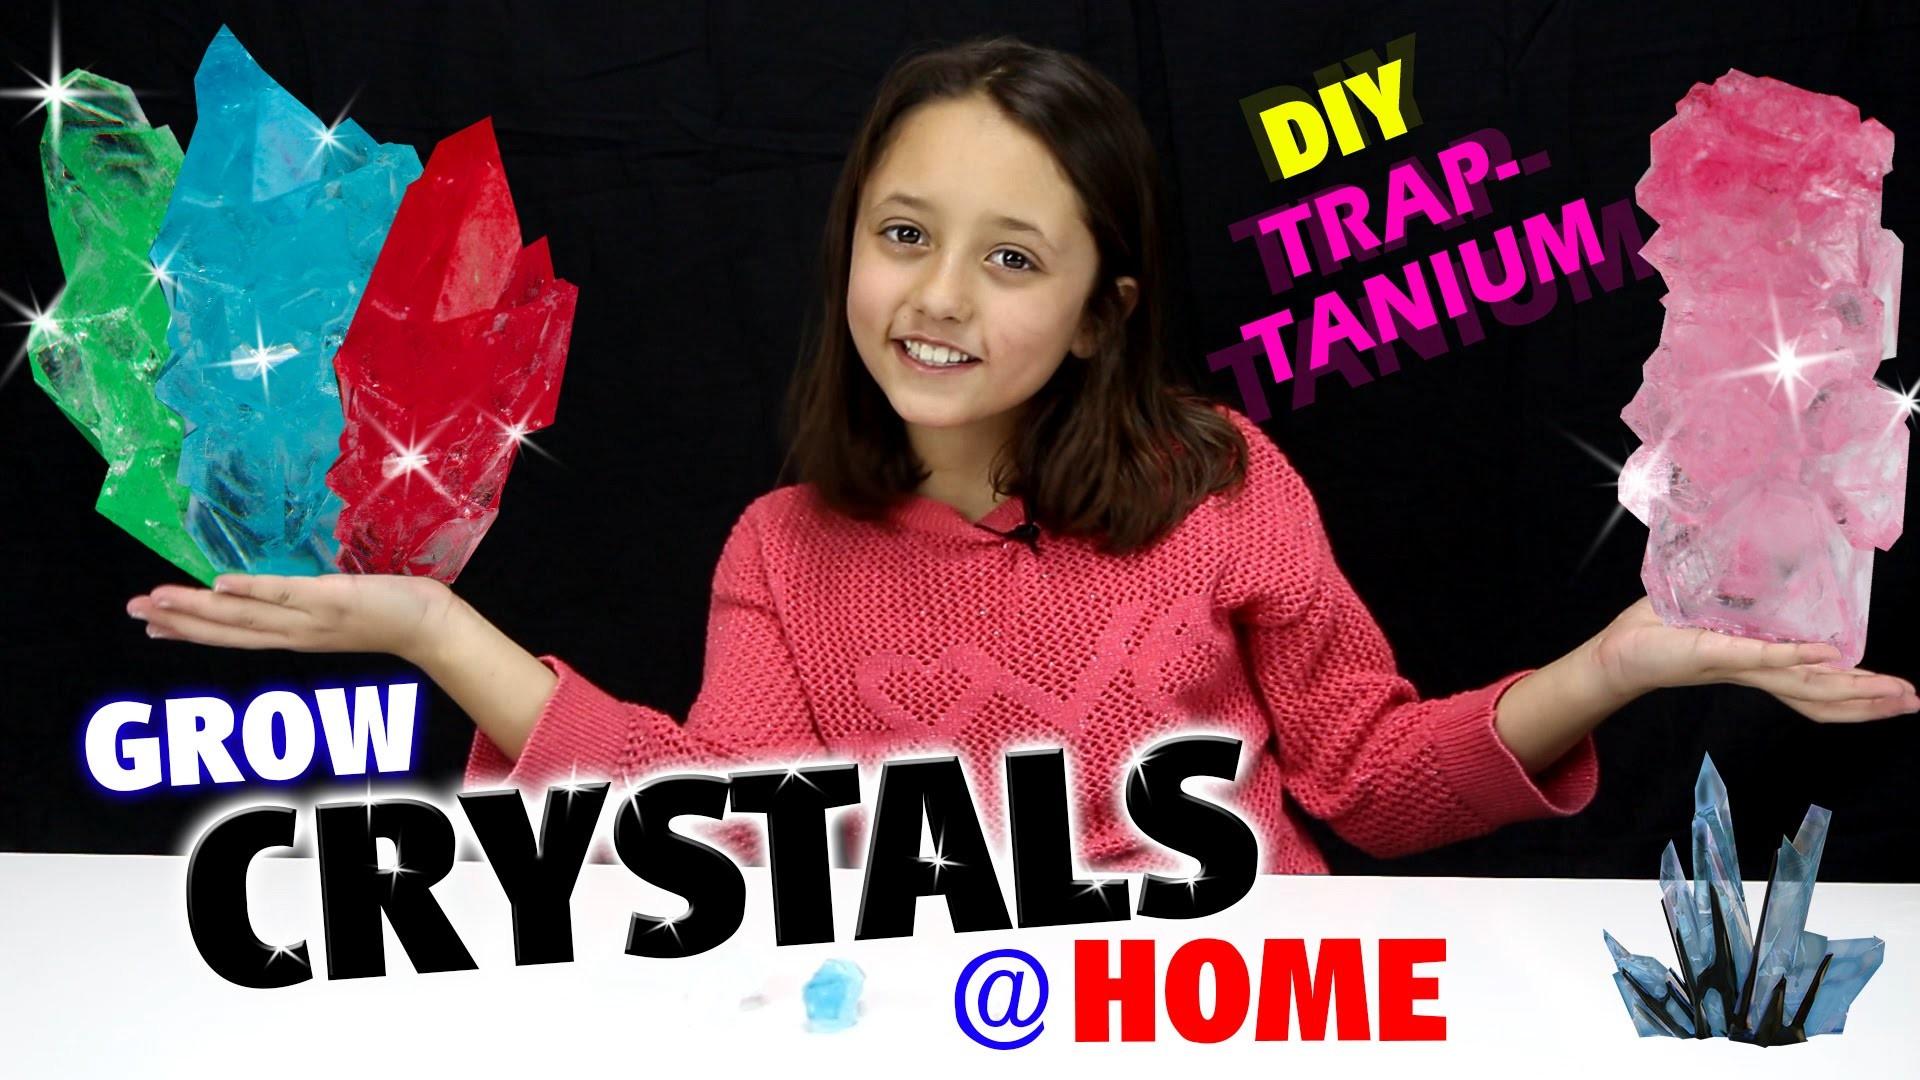 GROW CRYSTALS AT HOME!  DIY Traptanium. Skylanders Fun w. Sky Girl Lexi  (TRAP TEAM)